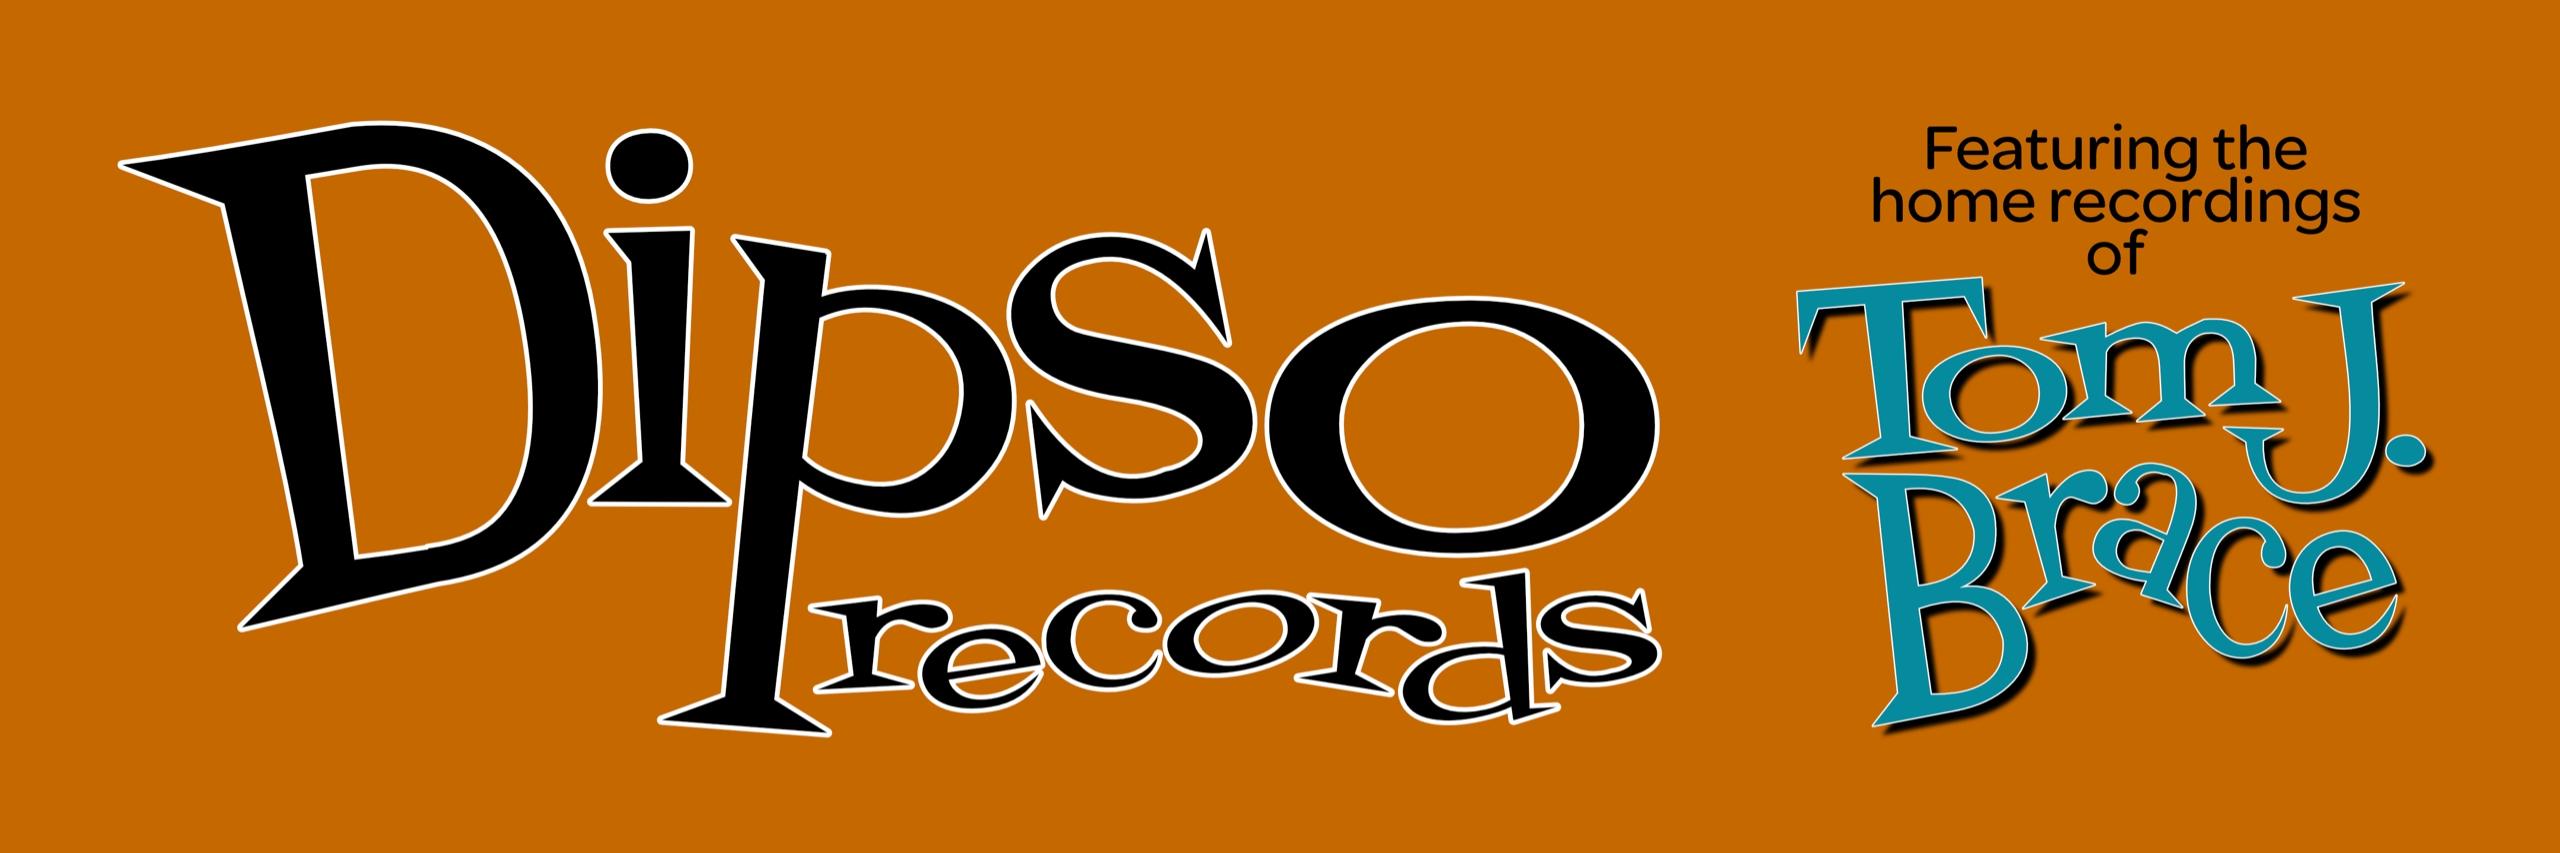 Dipso Records (@dipsorecords) Cover Image